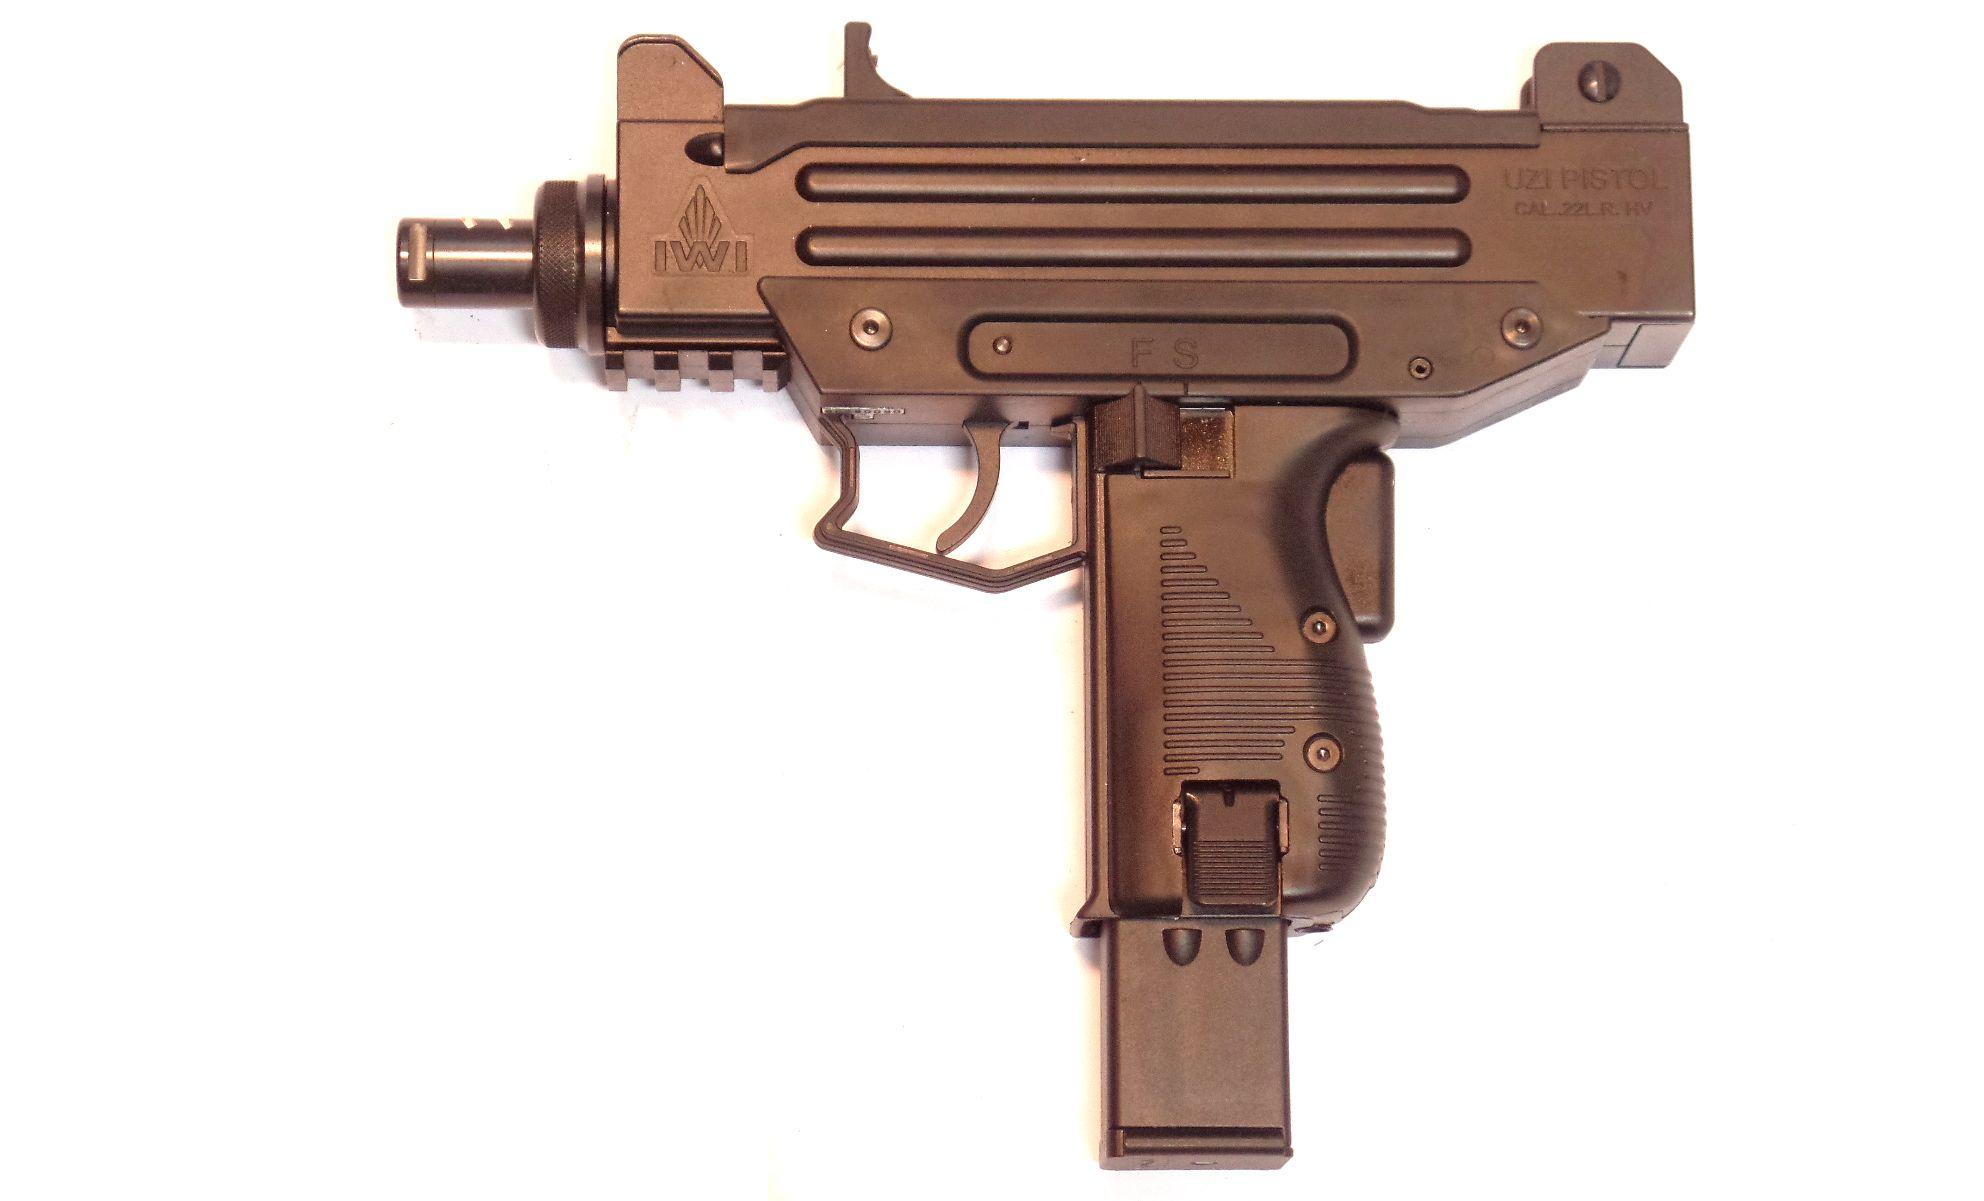 IMI / IWI UZI Pistol calibre 22LR